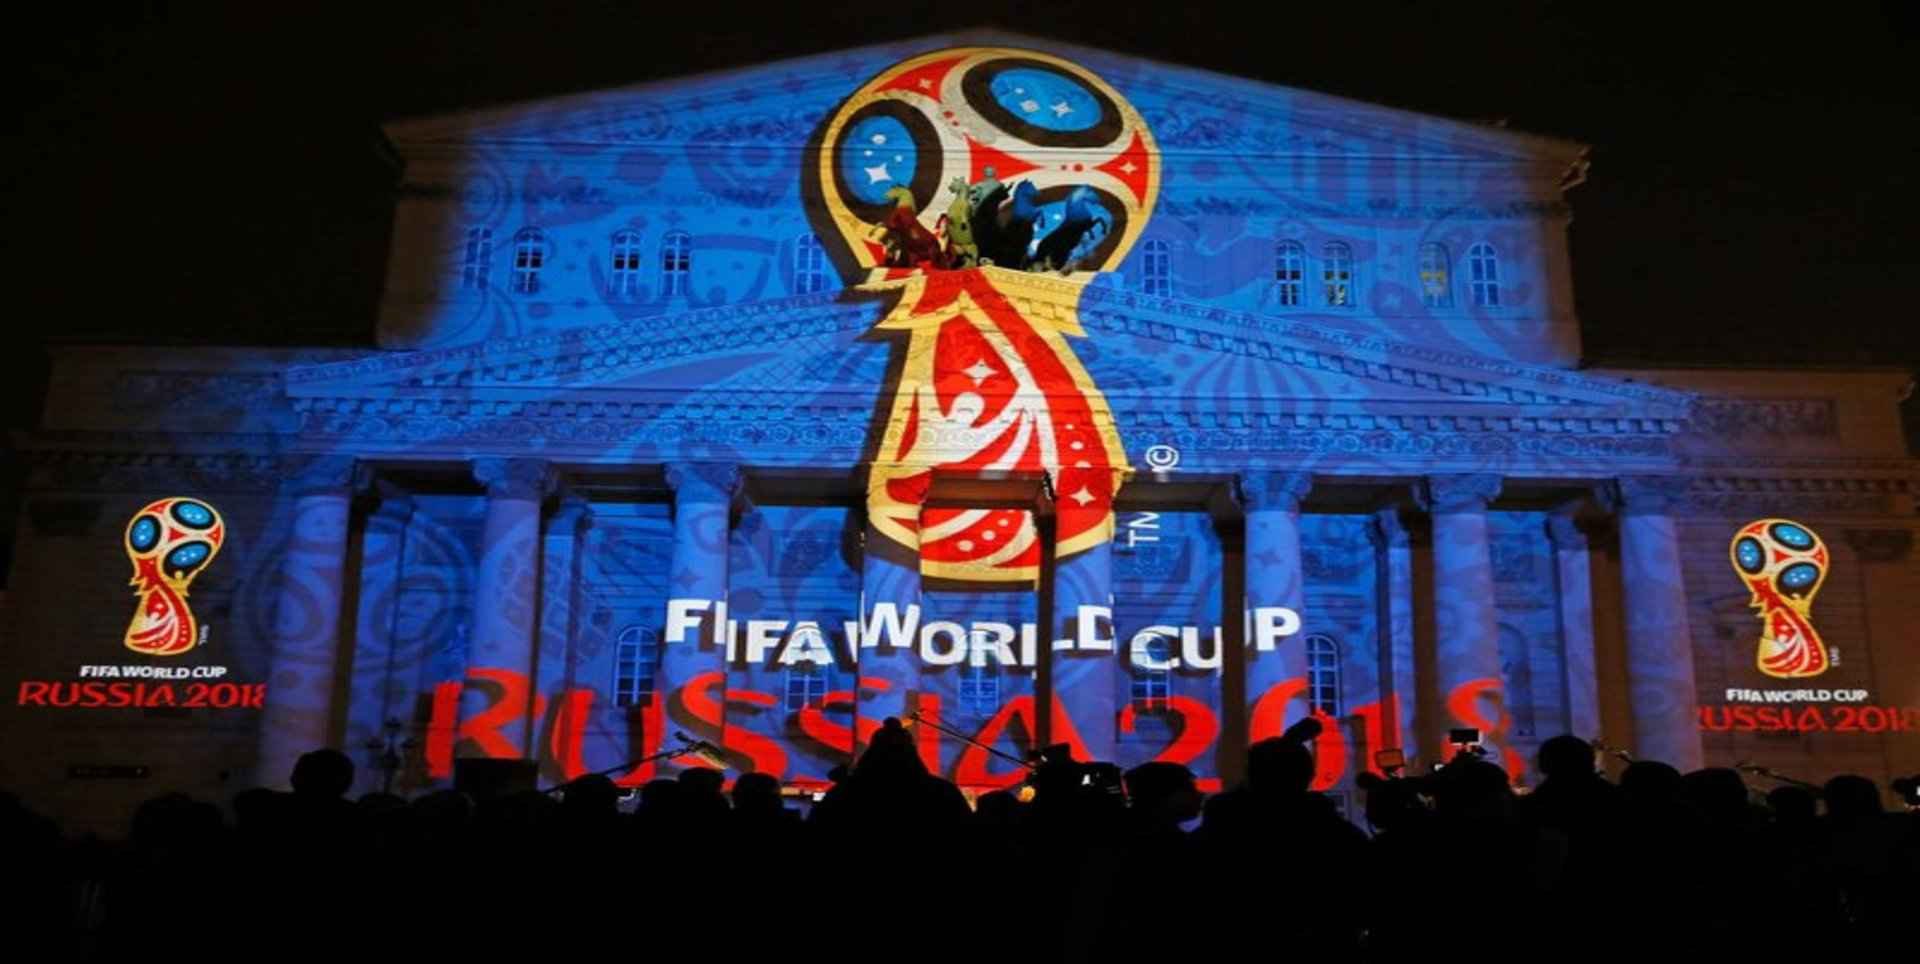 FIFA WC Republic of Ireland VS Serbia Live